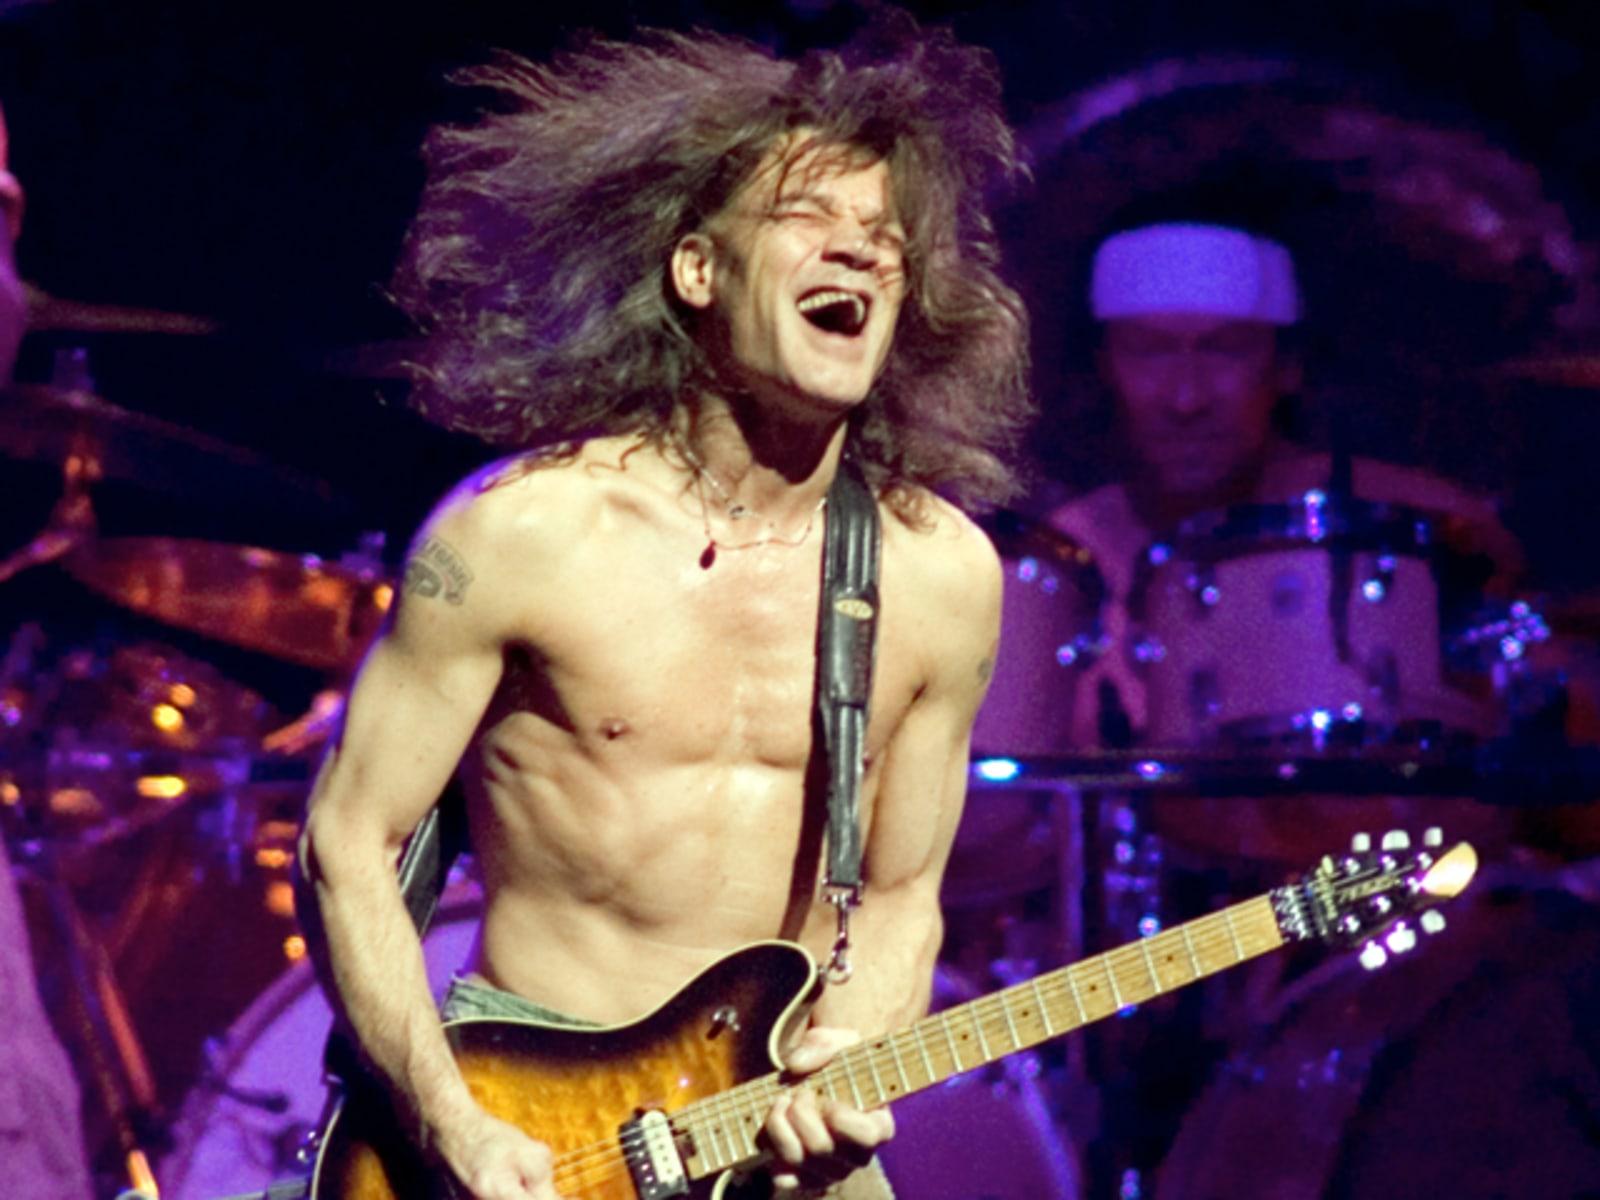 Van Halen in concert at the Mandalay Bay Events Center